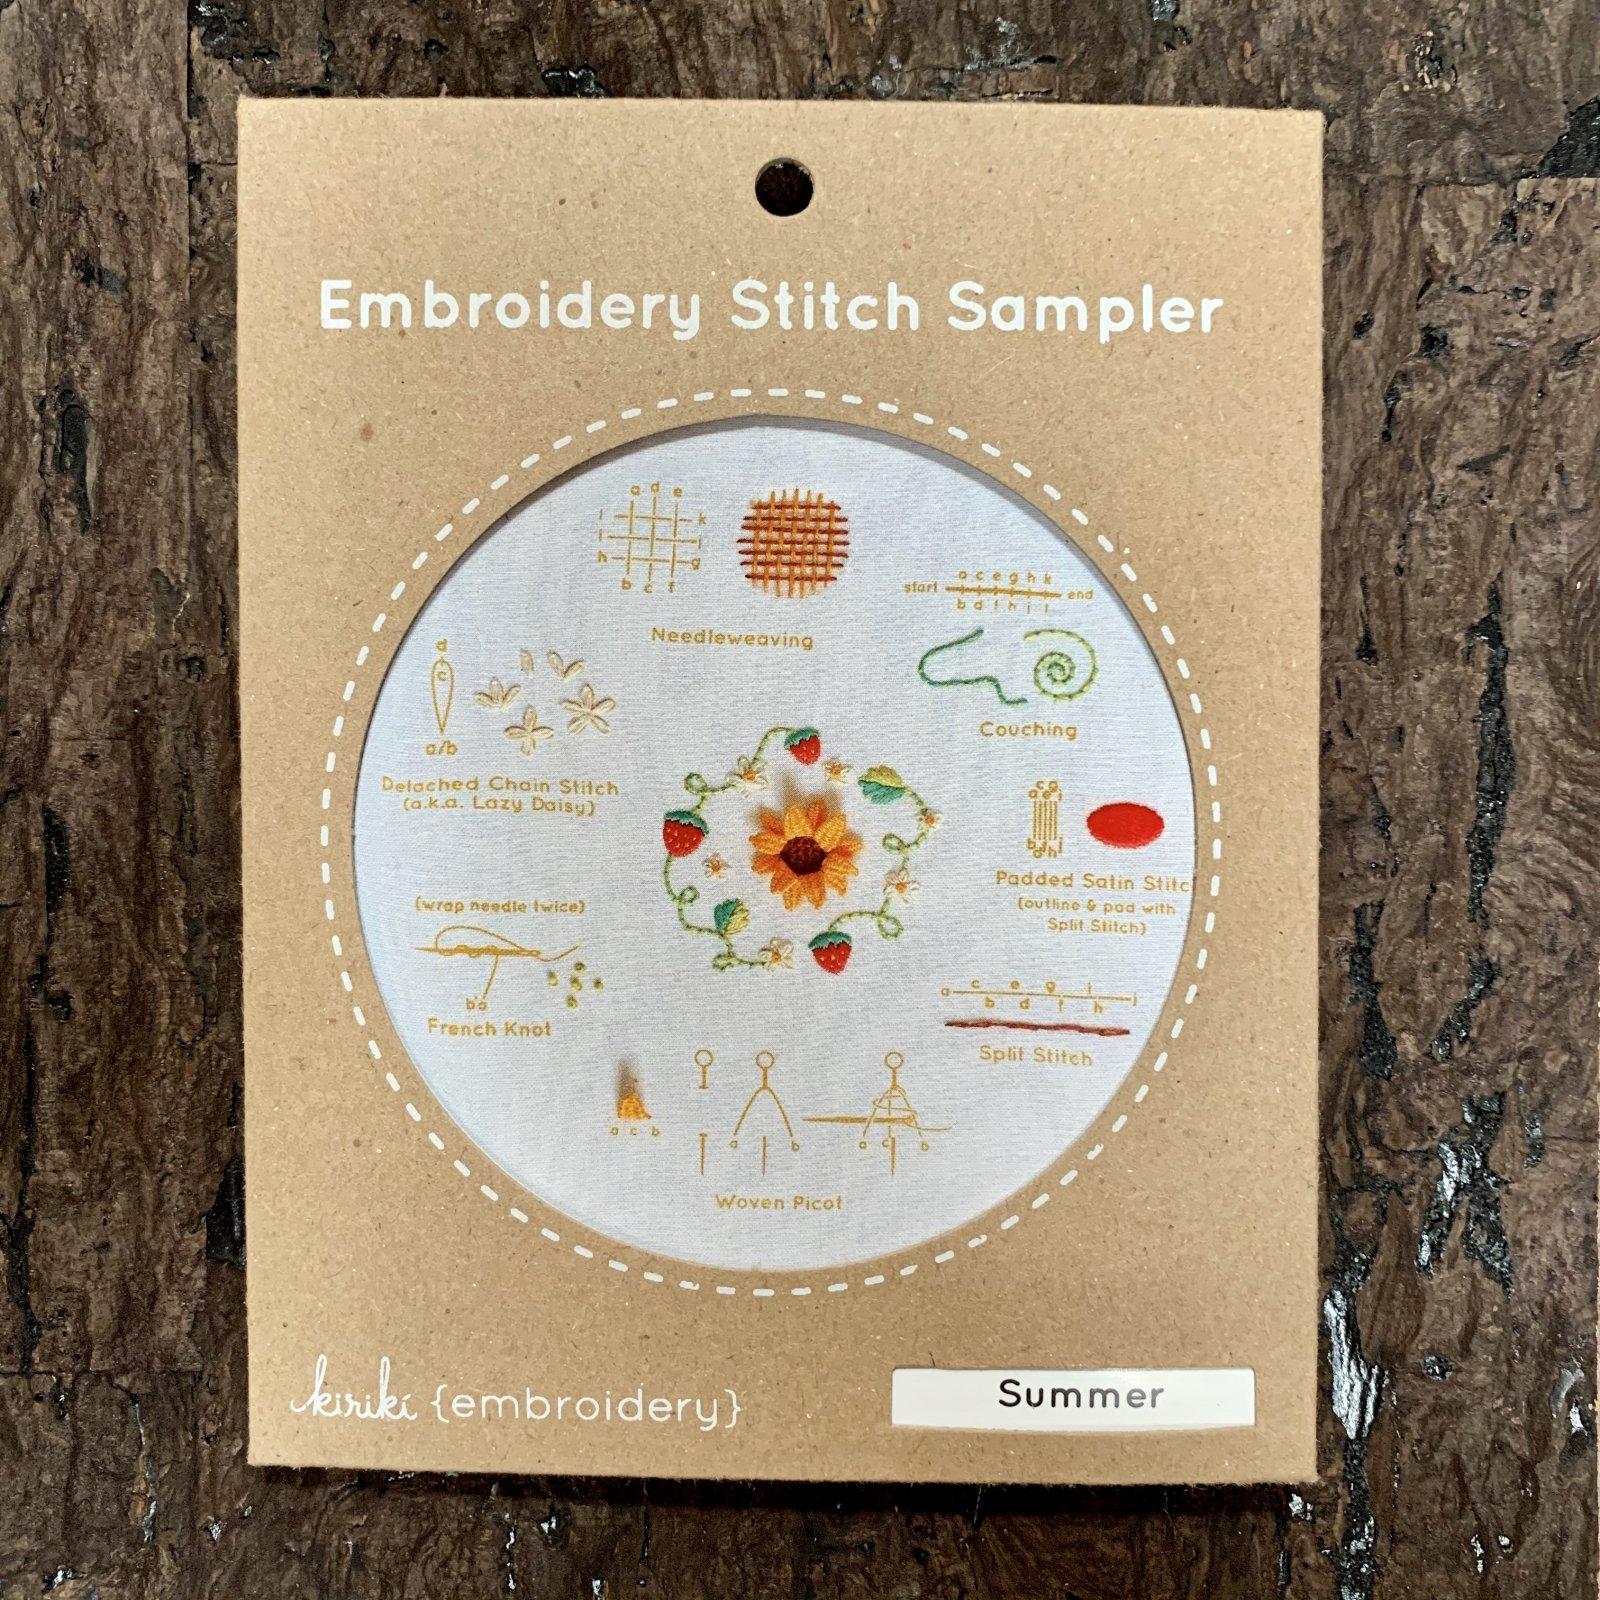 Summer - Kiriki Embroidery Stitch Sampler Kit